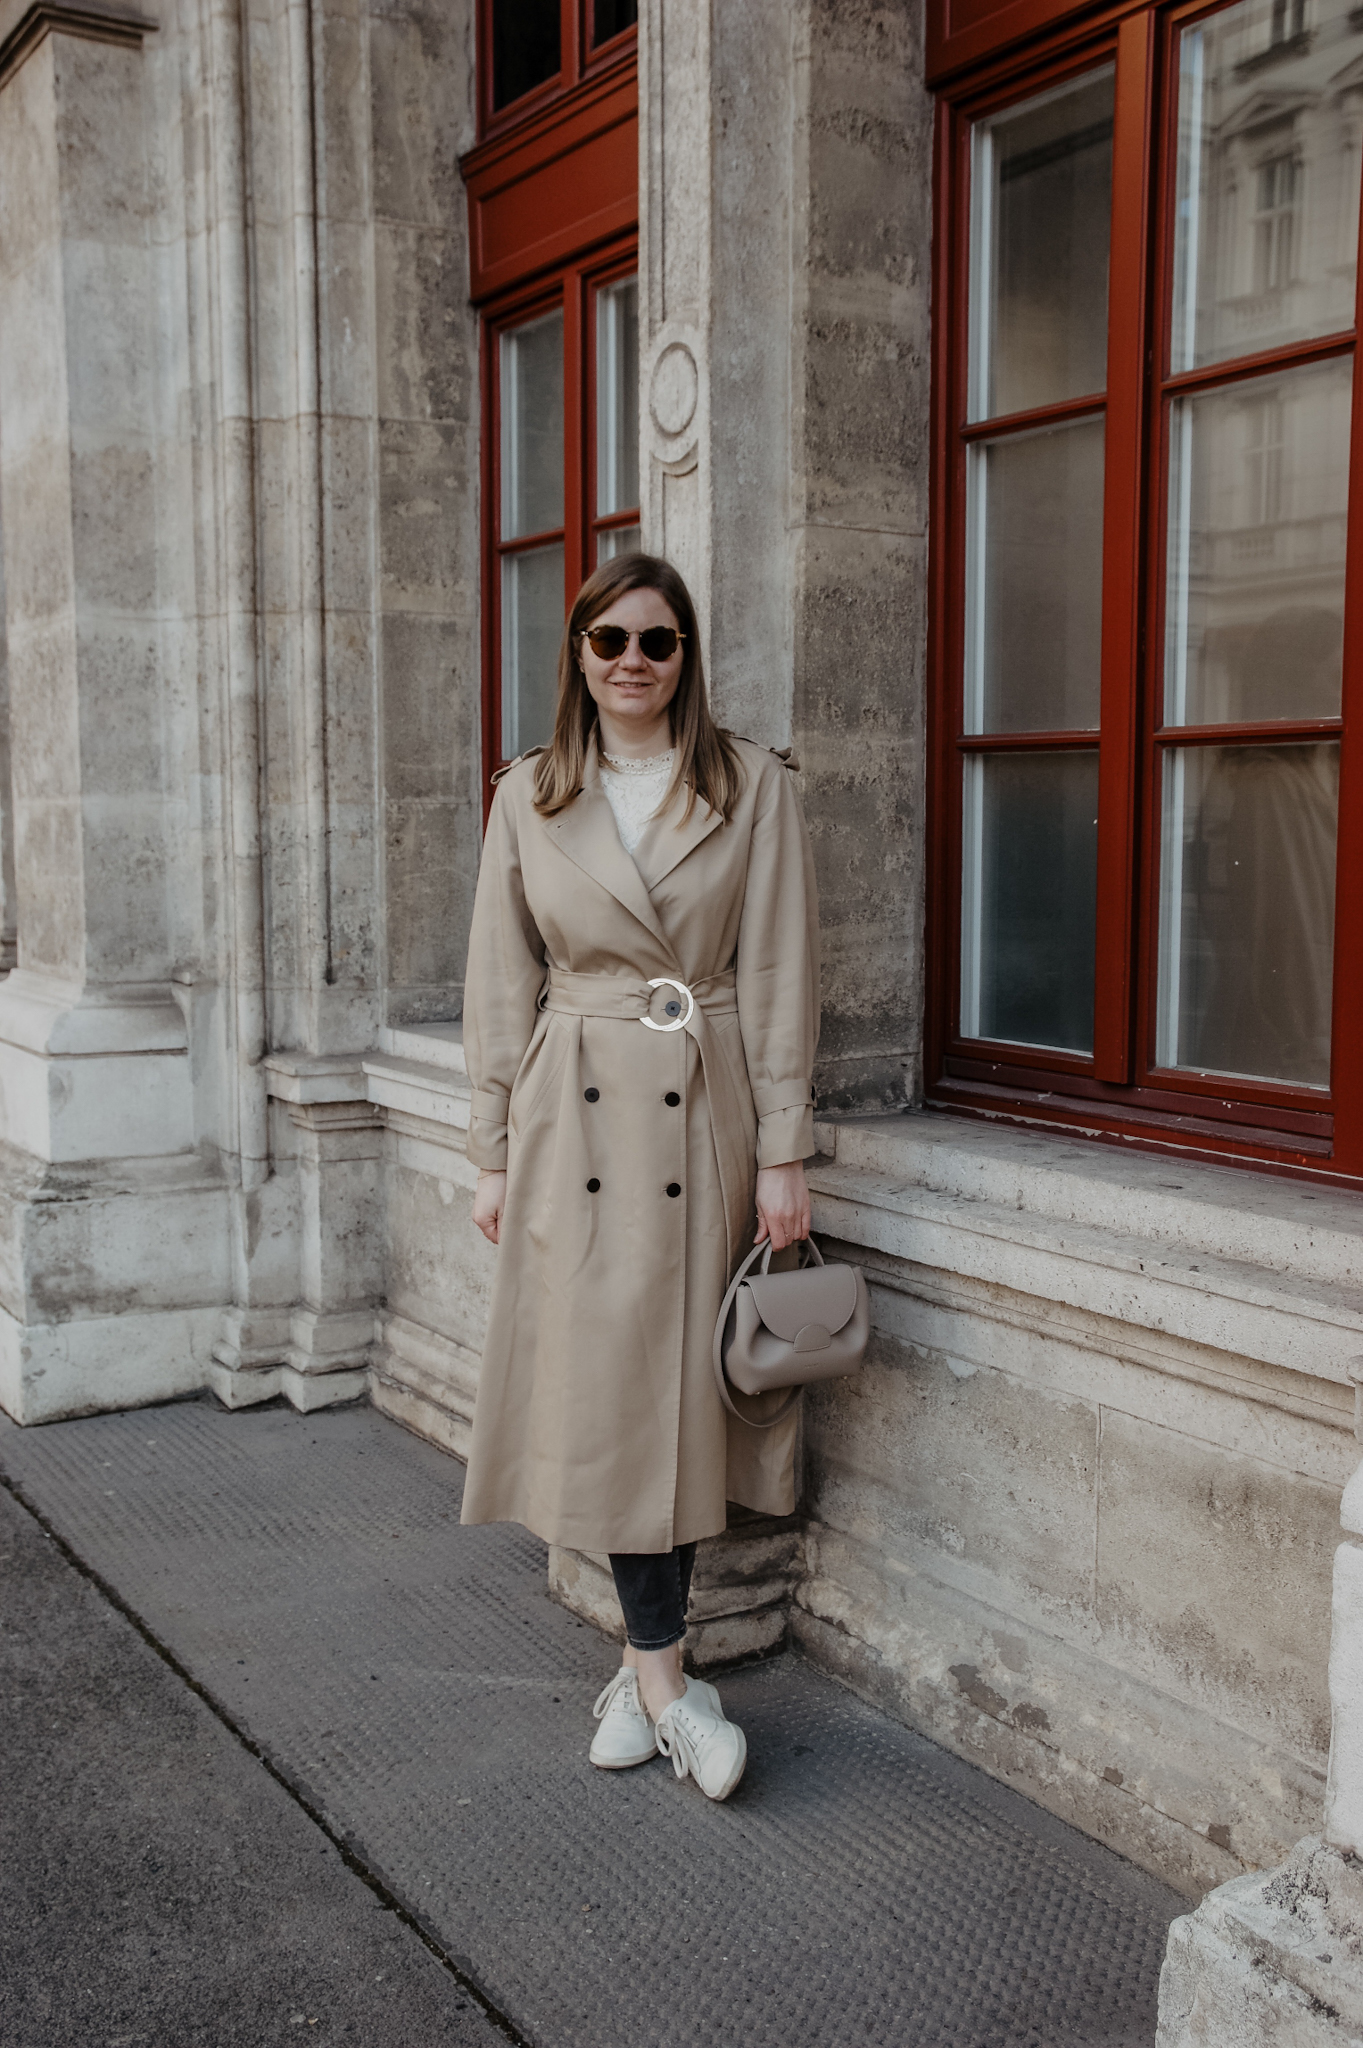 Klassische Trenchcoat Outfit im Frühling